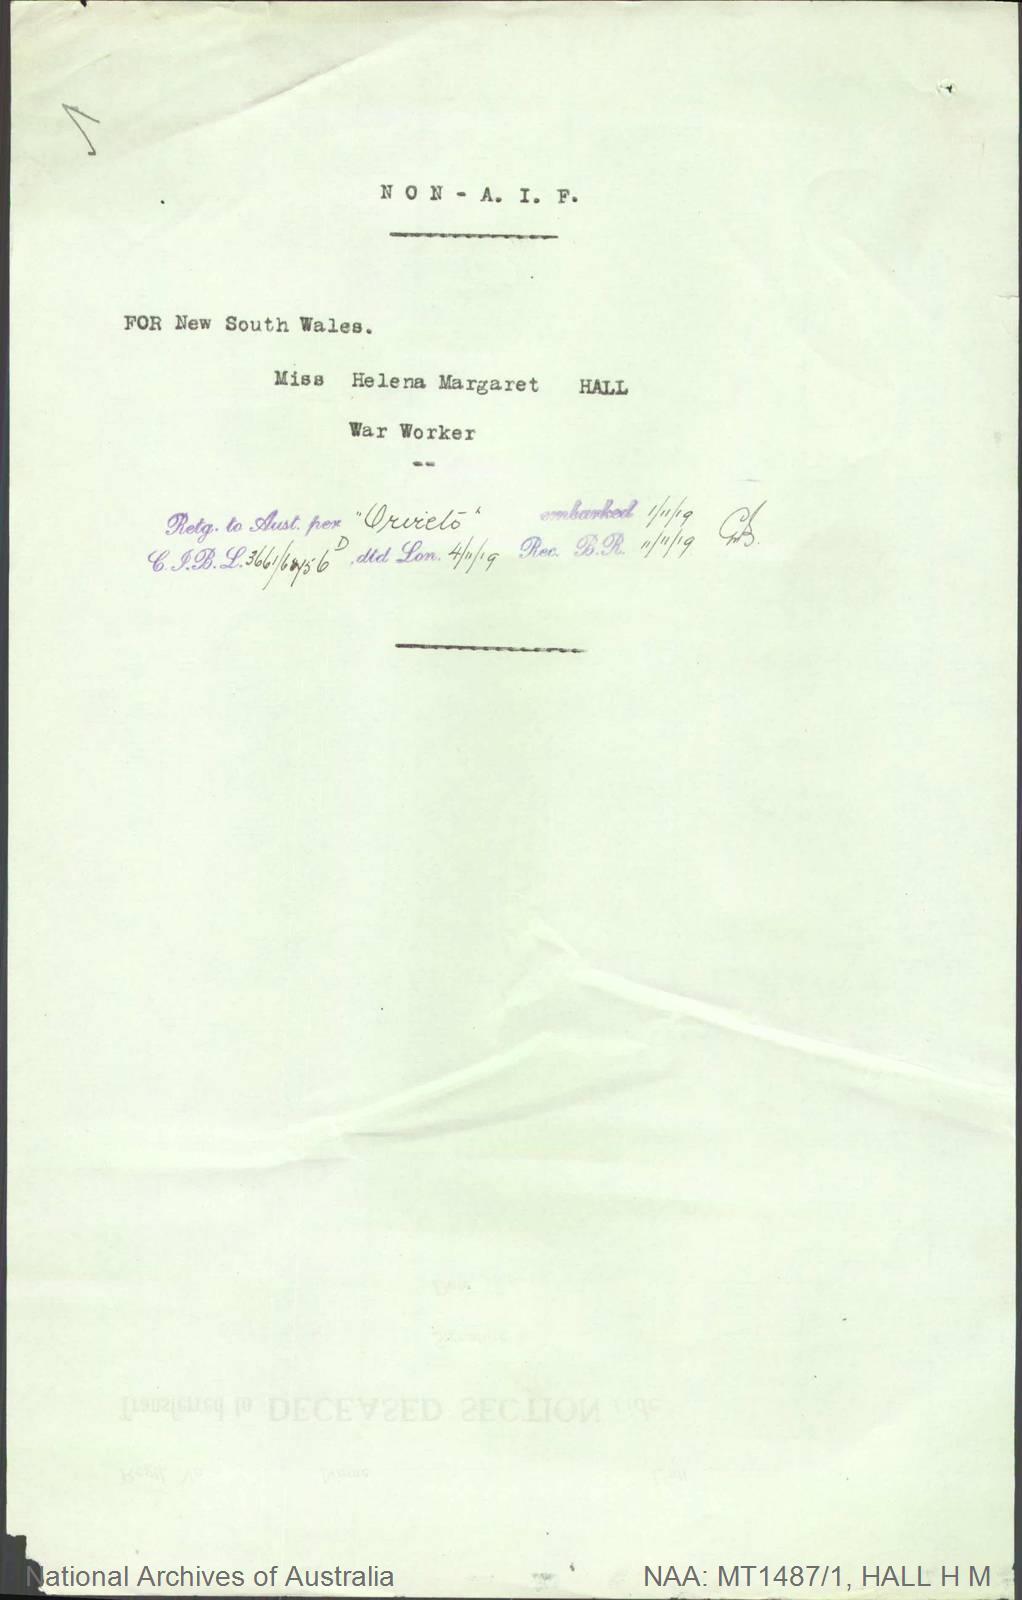 HALL Helena Margaret - War Worker - returning to Australia per Orvieto embarked 1 November 1919